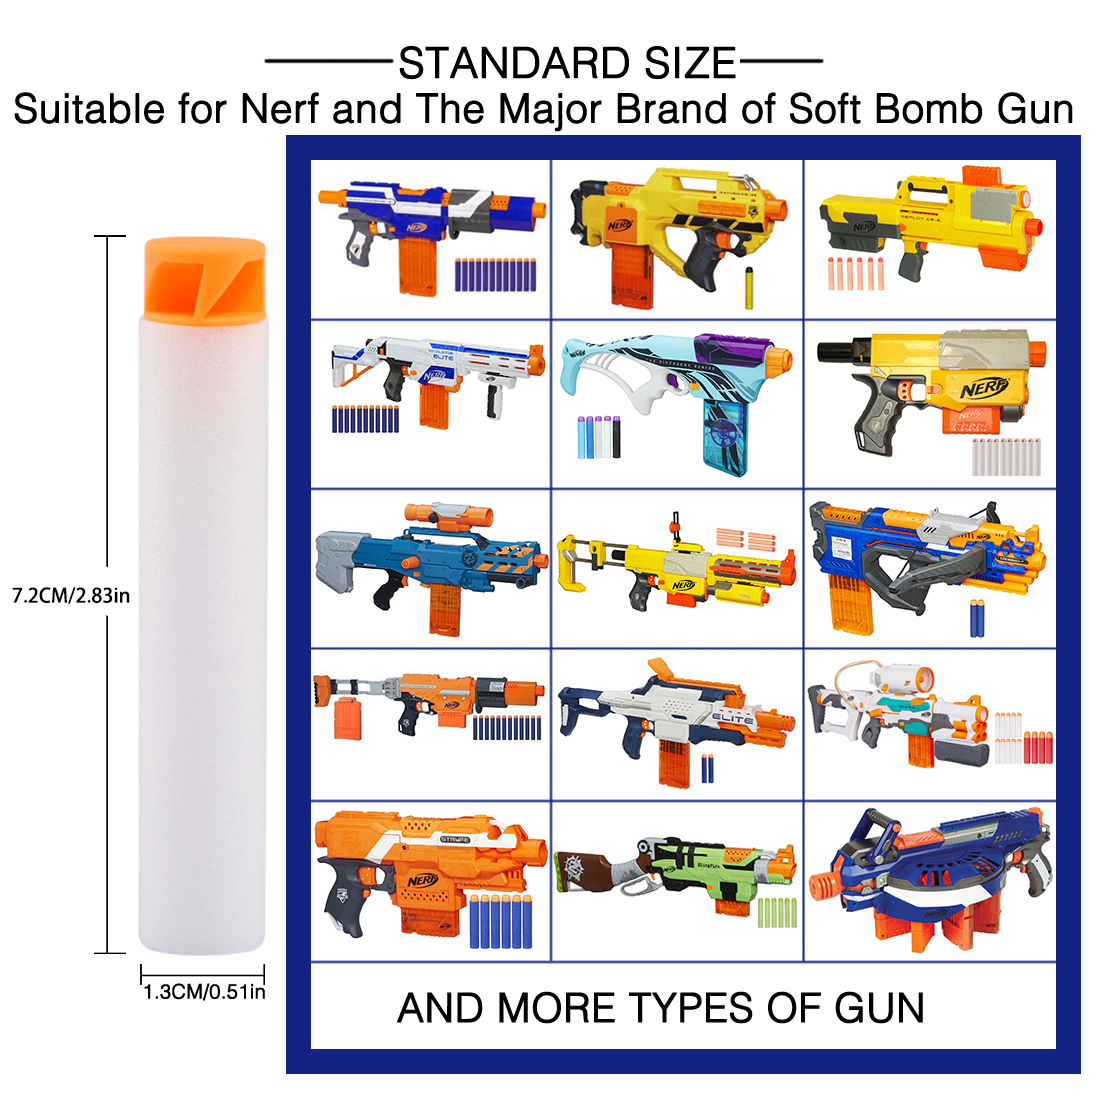 200pcs Soft Bullet Whirlwind Flat Head Foam Bullets For Nerf N-strike Elite Series Toys & Hobbies